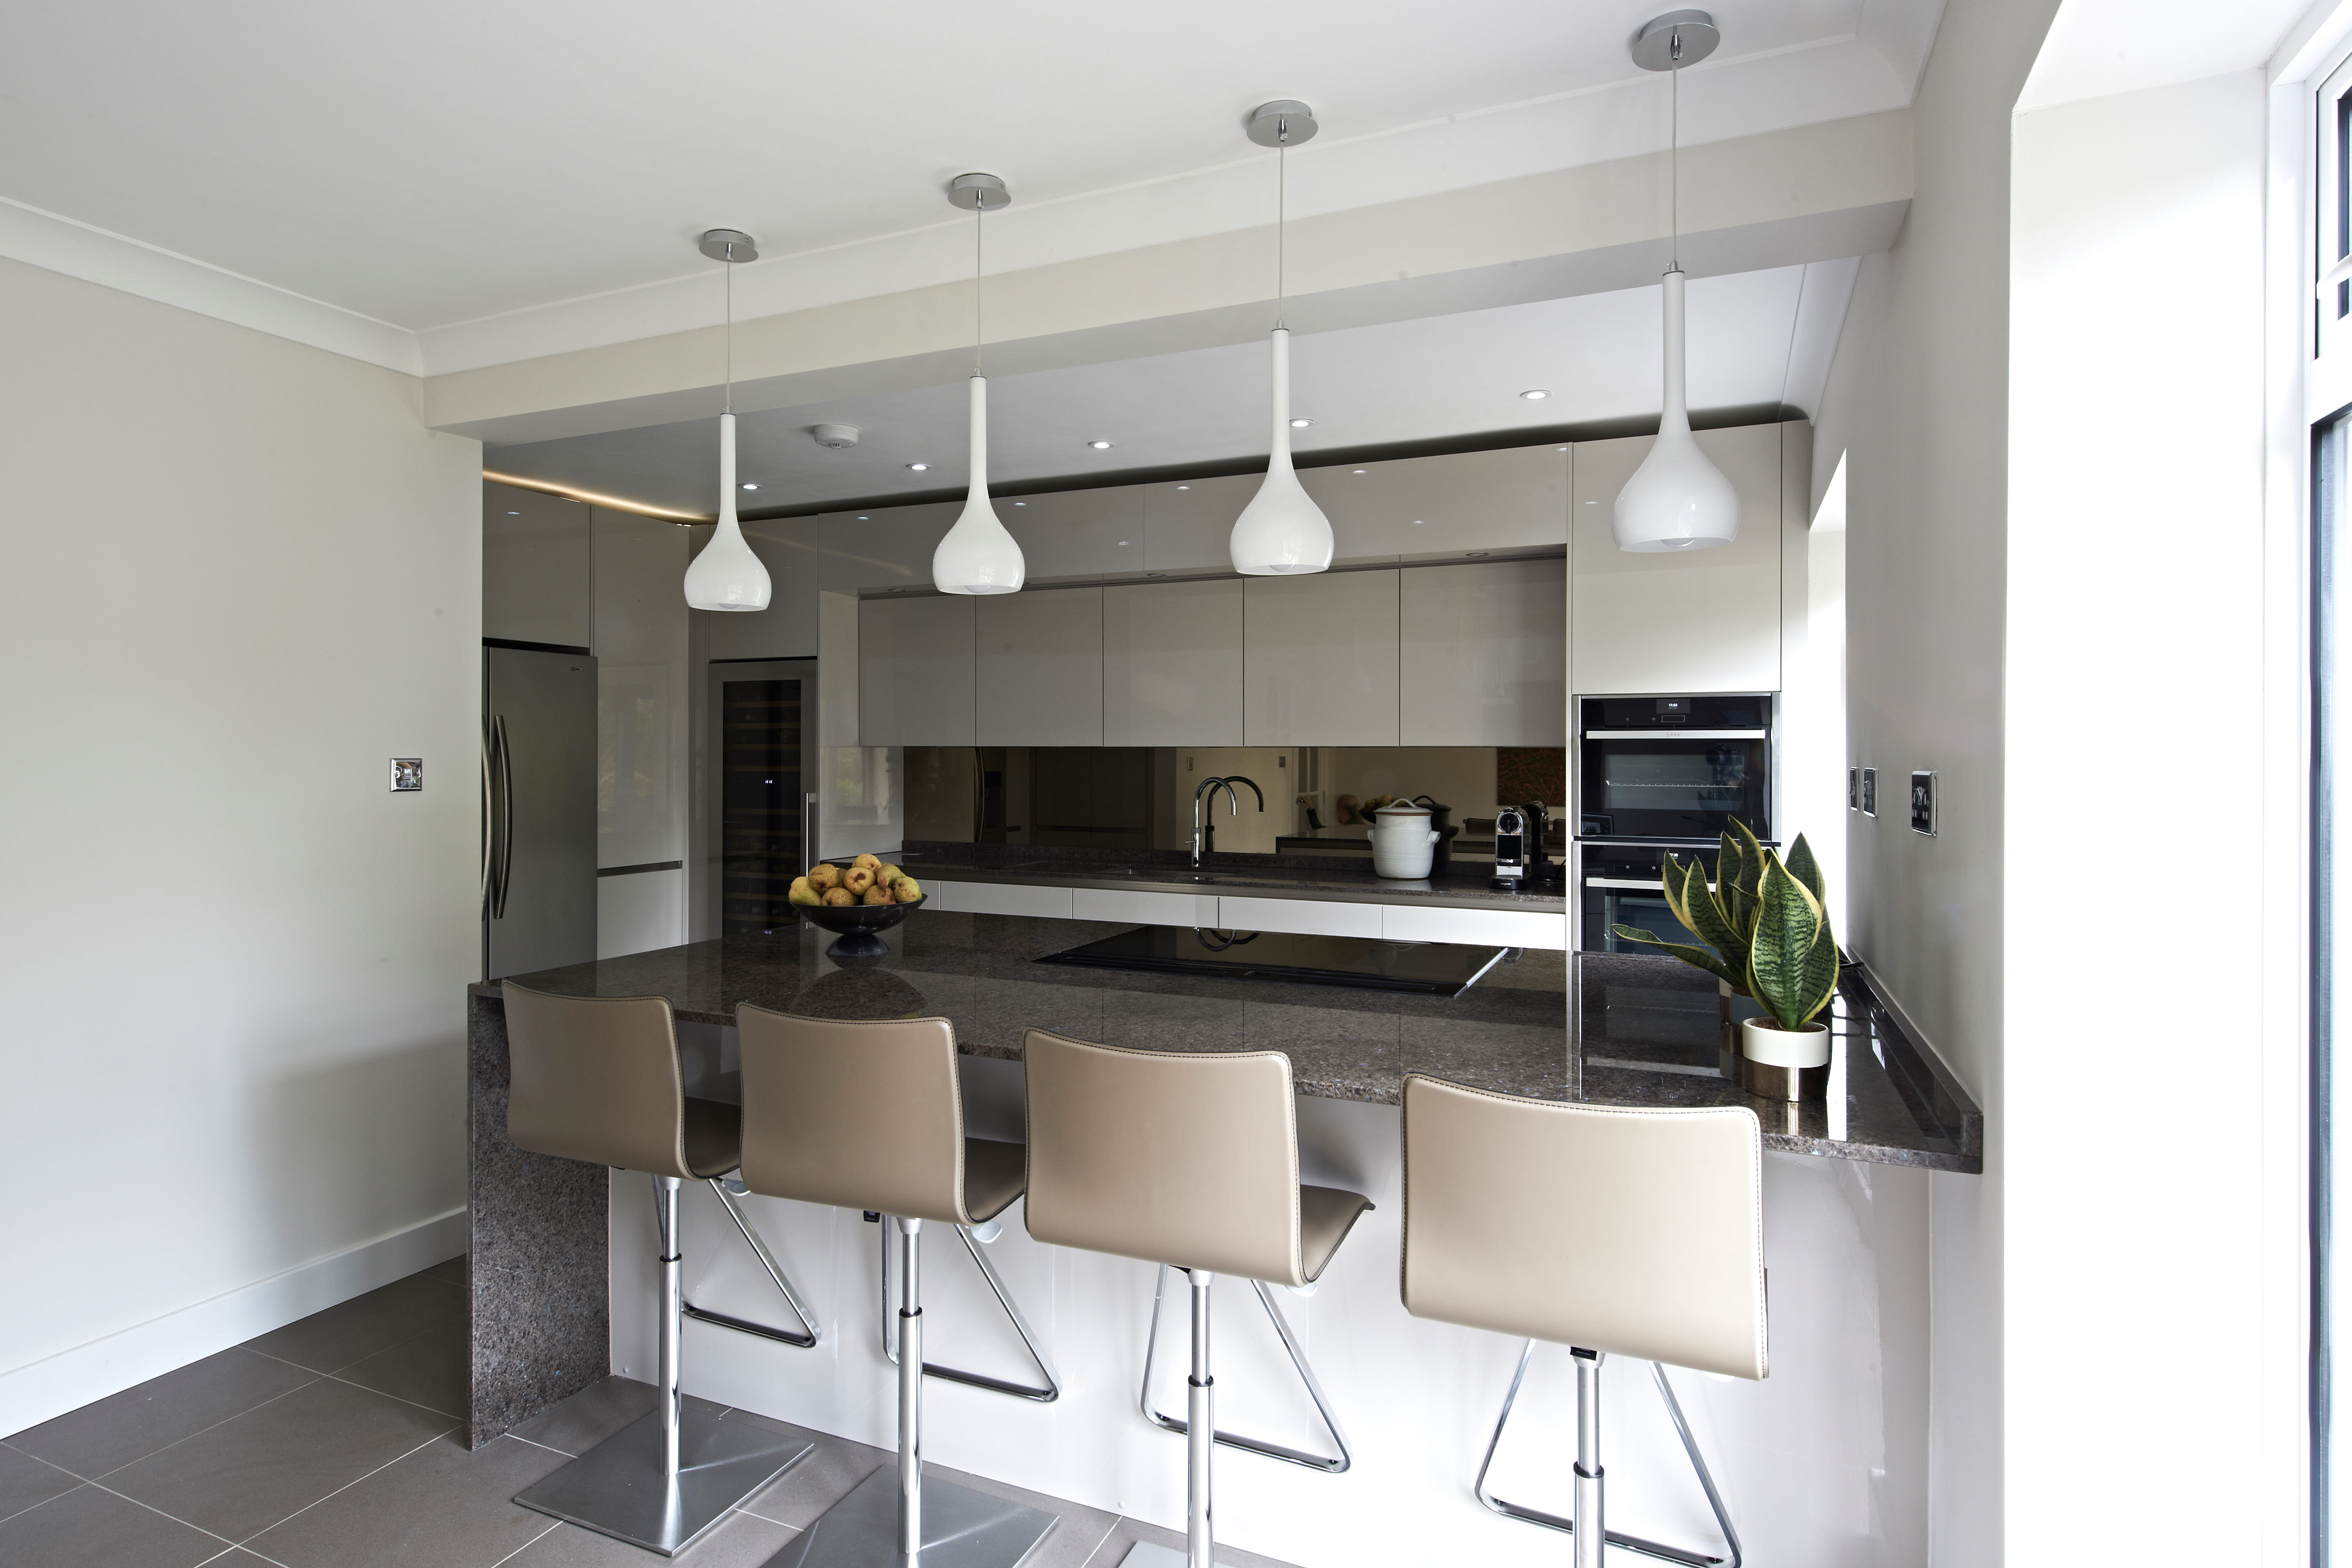 https://www.designer-kitchens.co.uk/wp-content/uploads/2019/10/RICHMONDROAD-34599.jpg